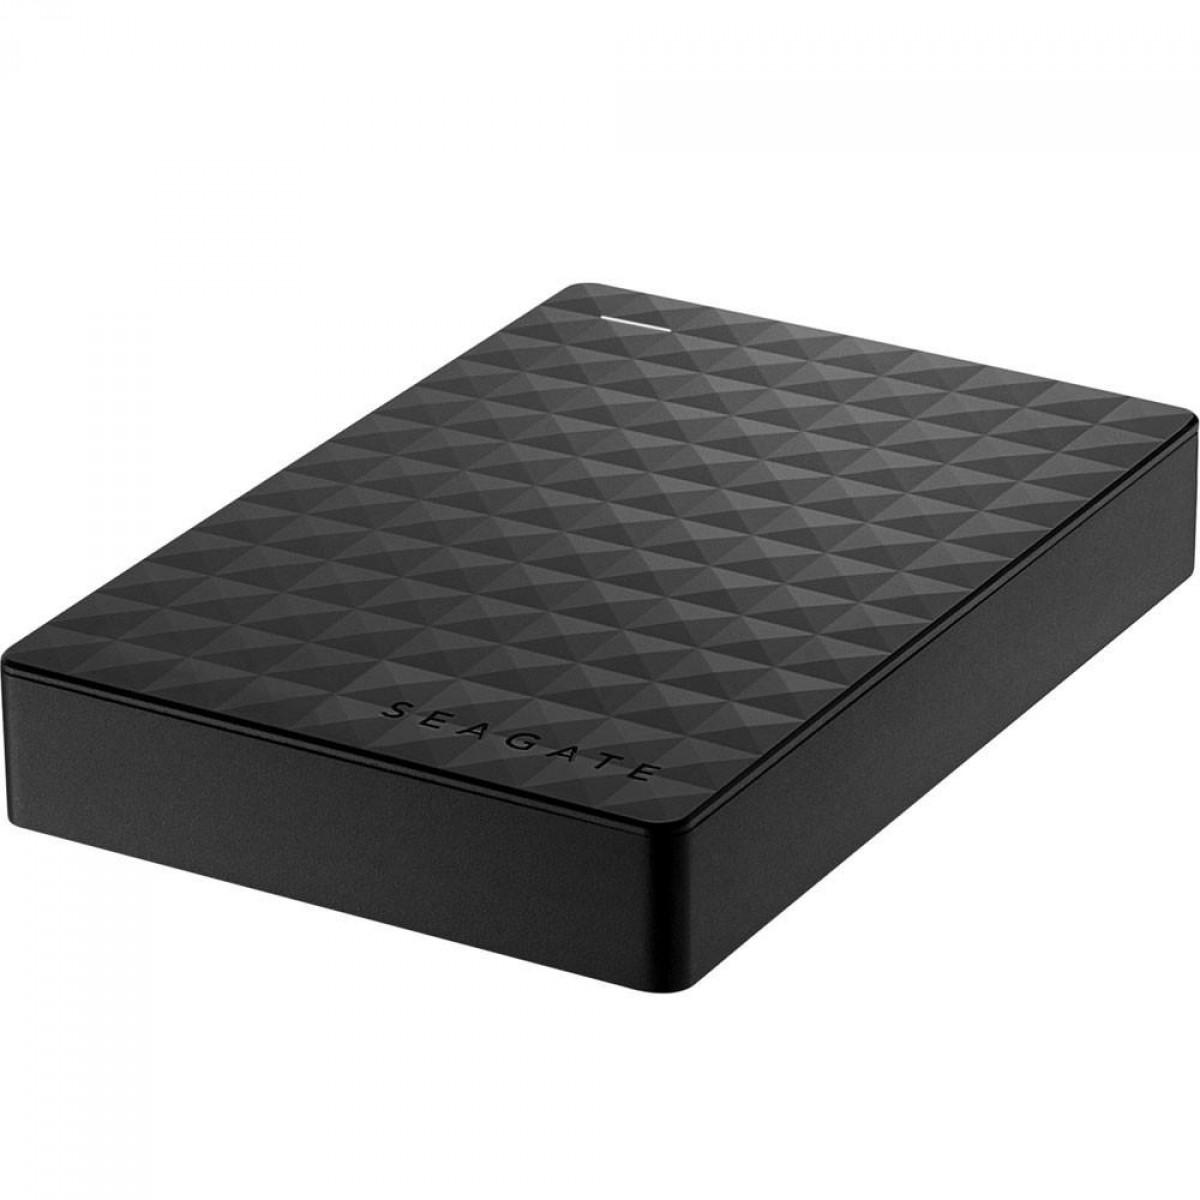 HD Externo Portátil Seagate Expansion 4TB USB 3.0 Preto, STEA4000400